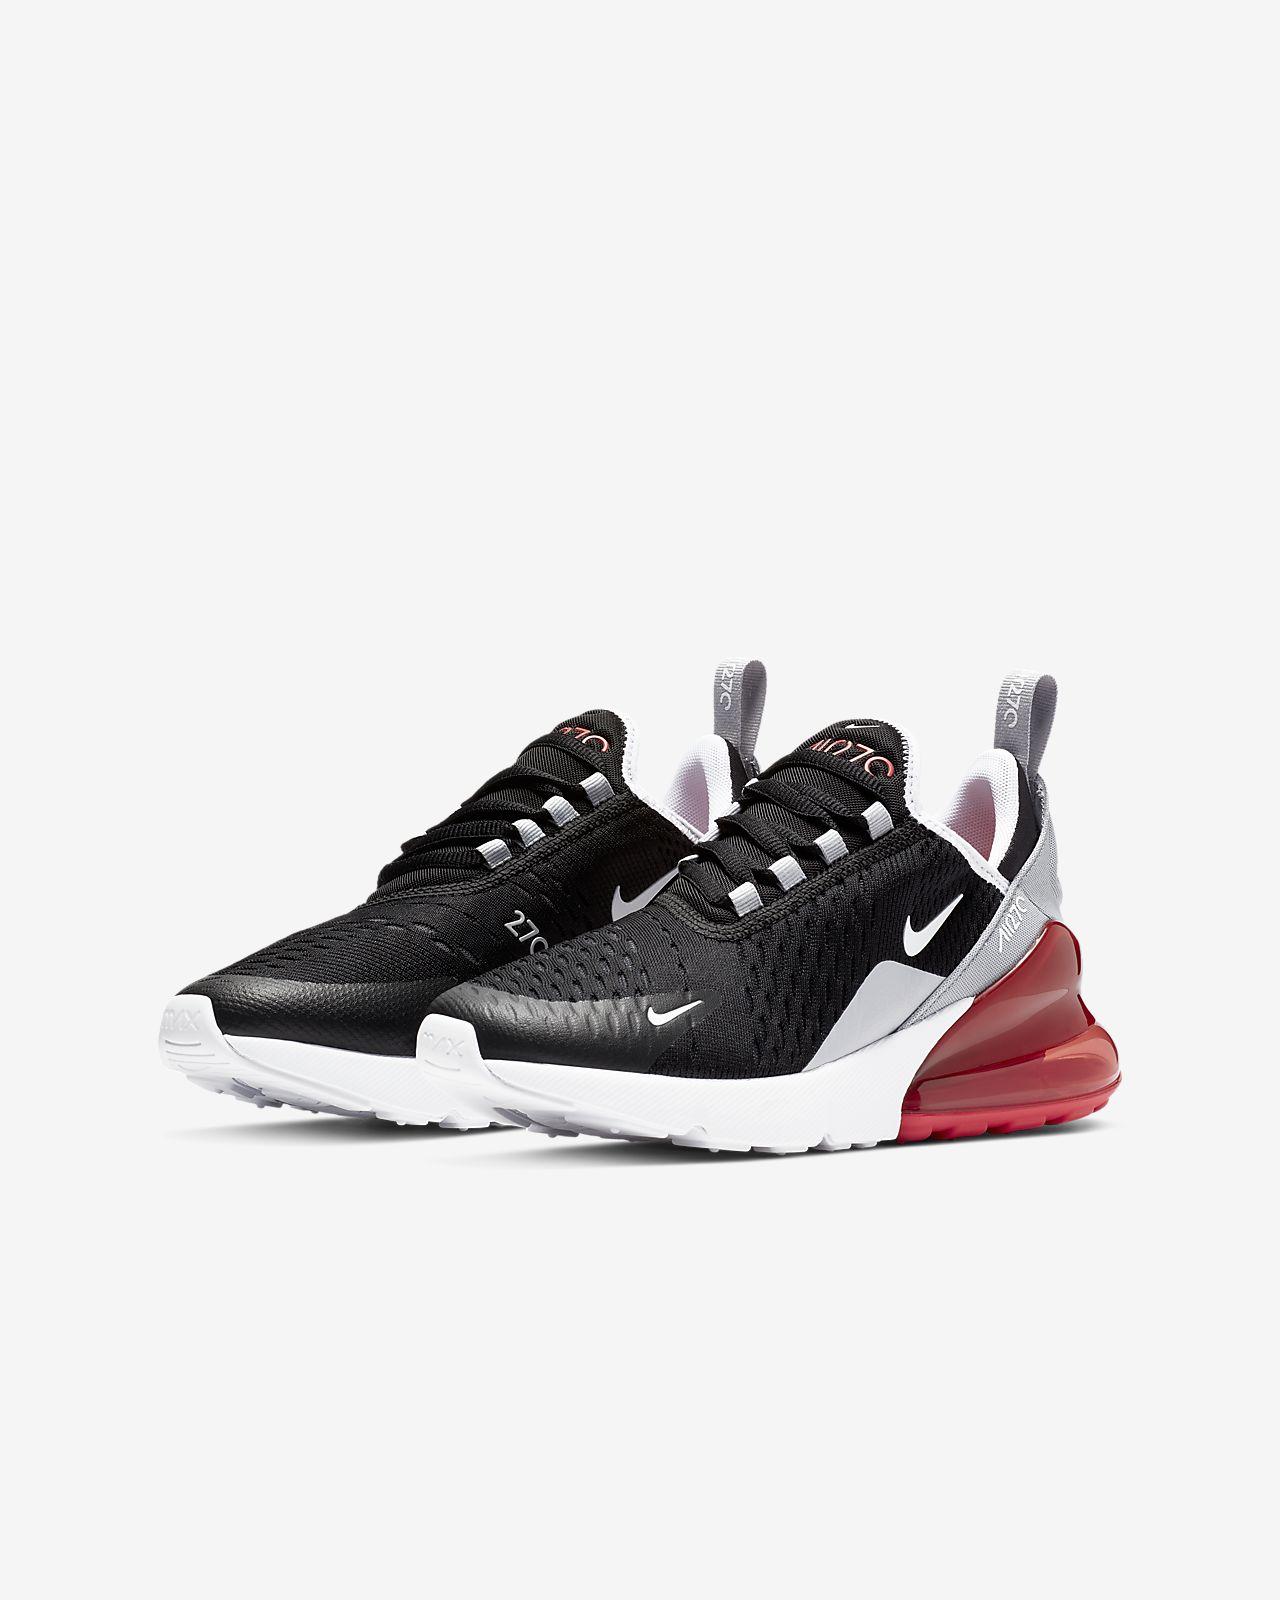 270 Mbf6gviy7y Air Chaussure Plus Nike Enfant Max Âgéch Pour CeWrodxB